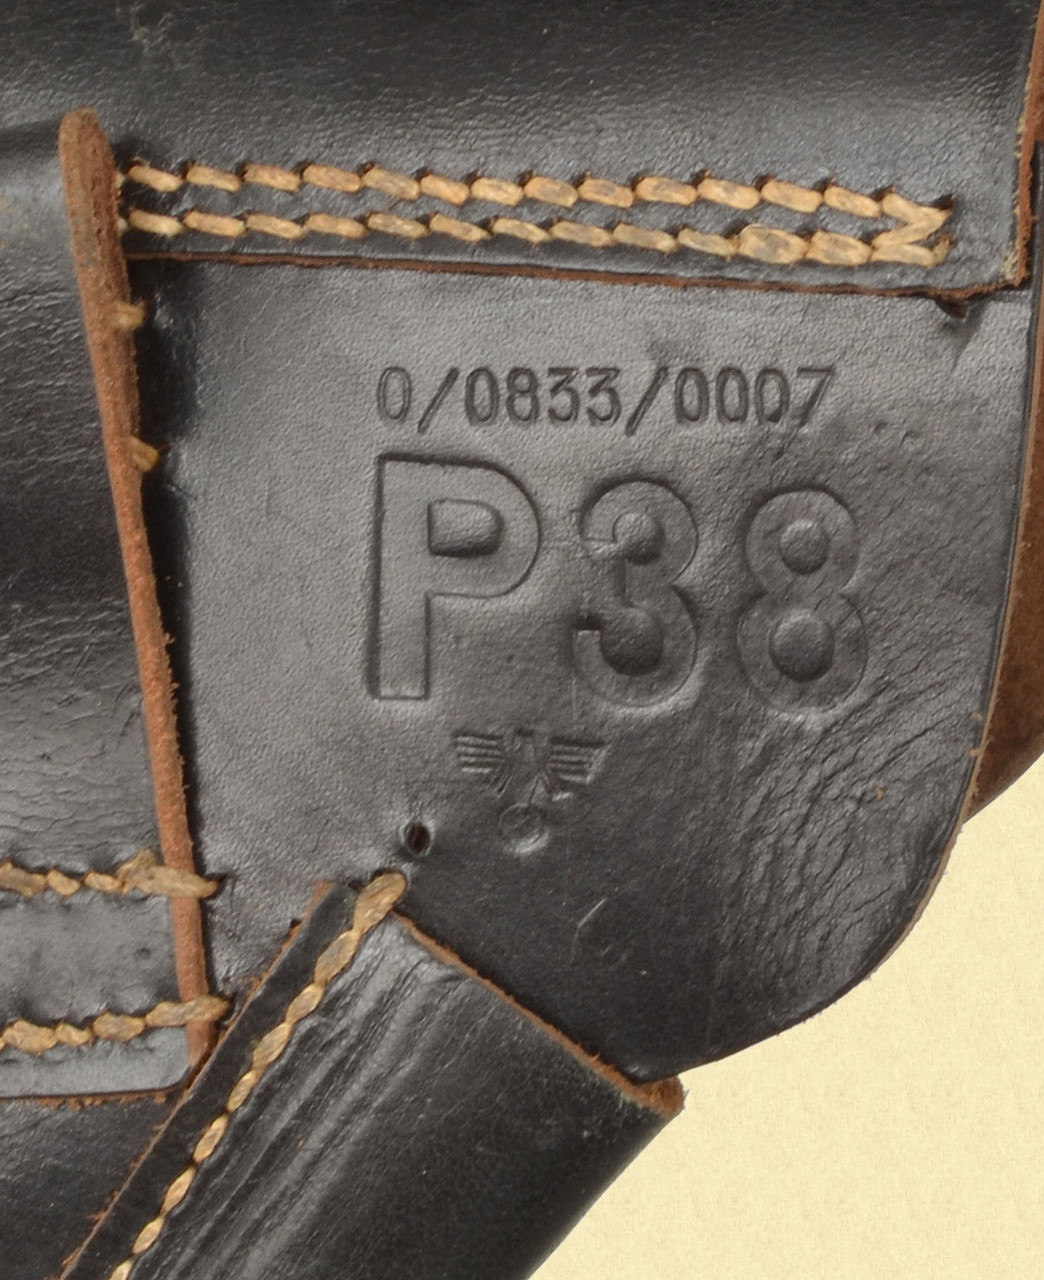 GERMAN P 38 POLICE HOLSTER - M7625